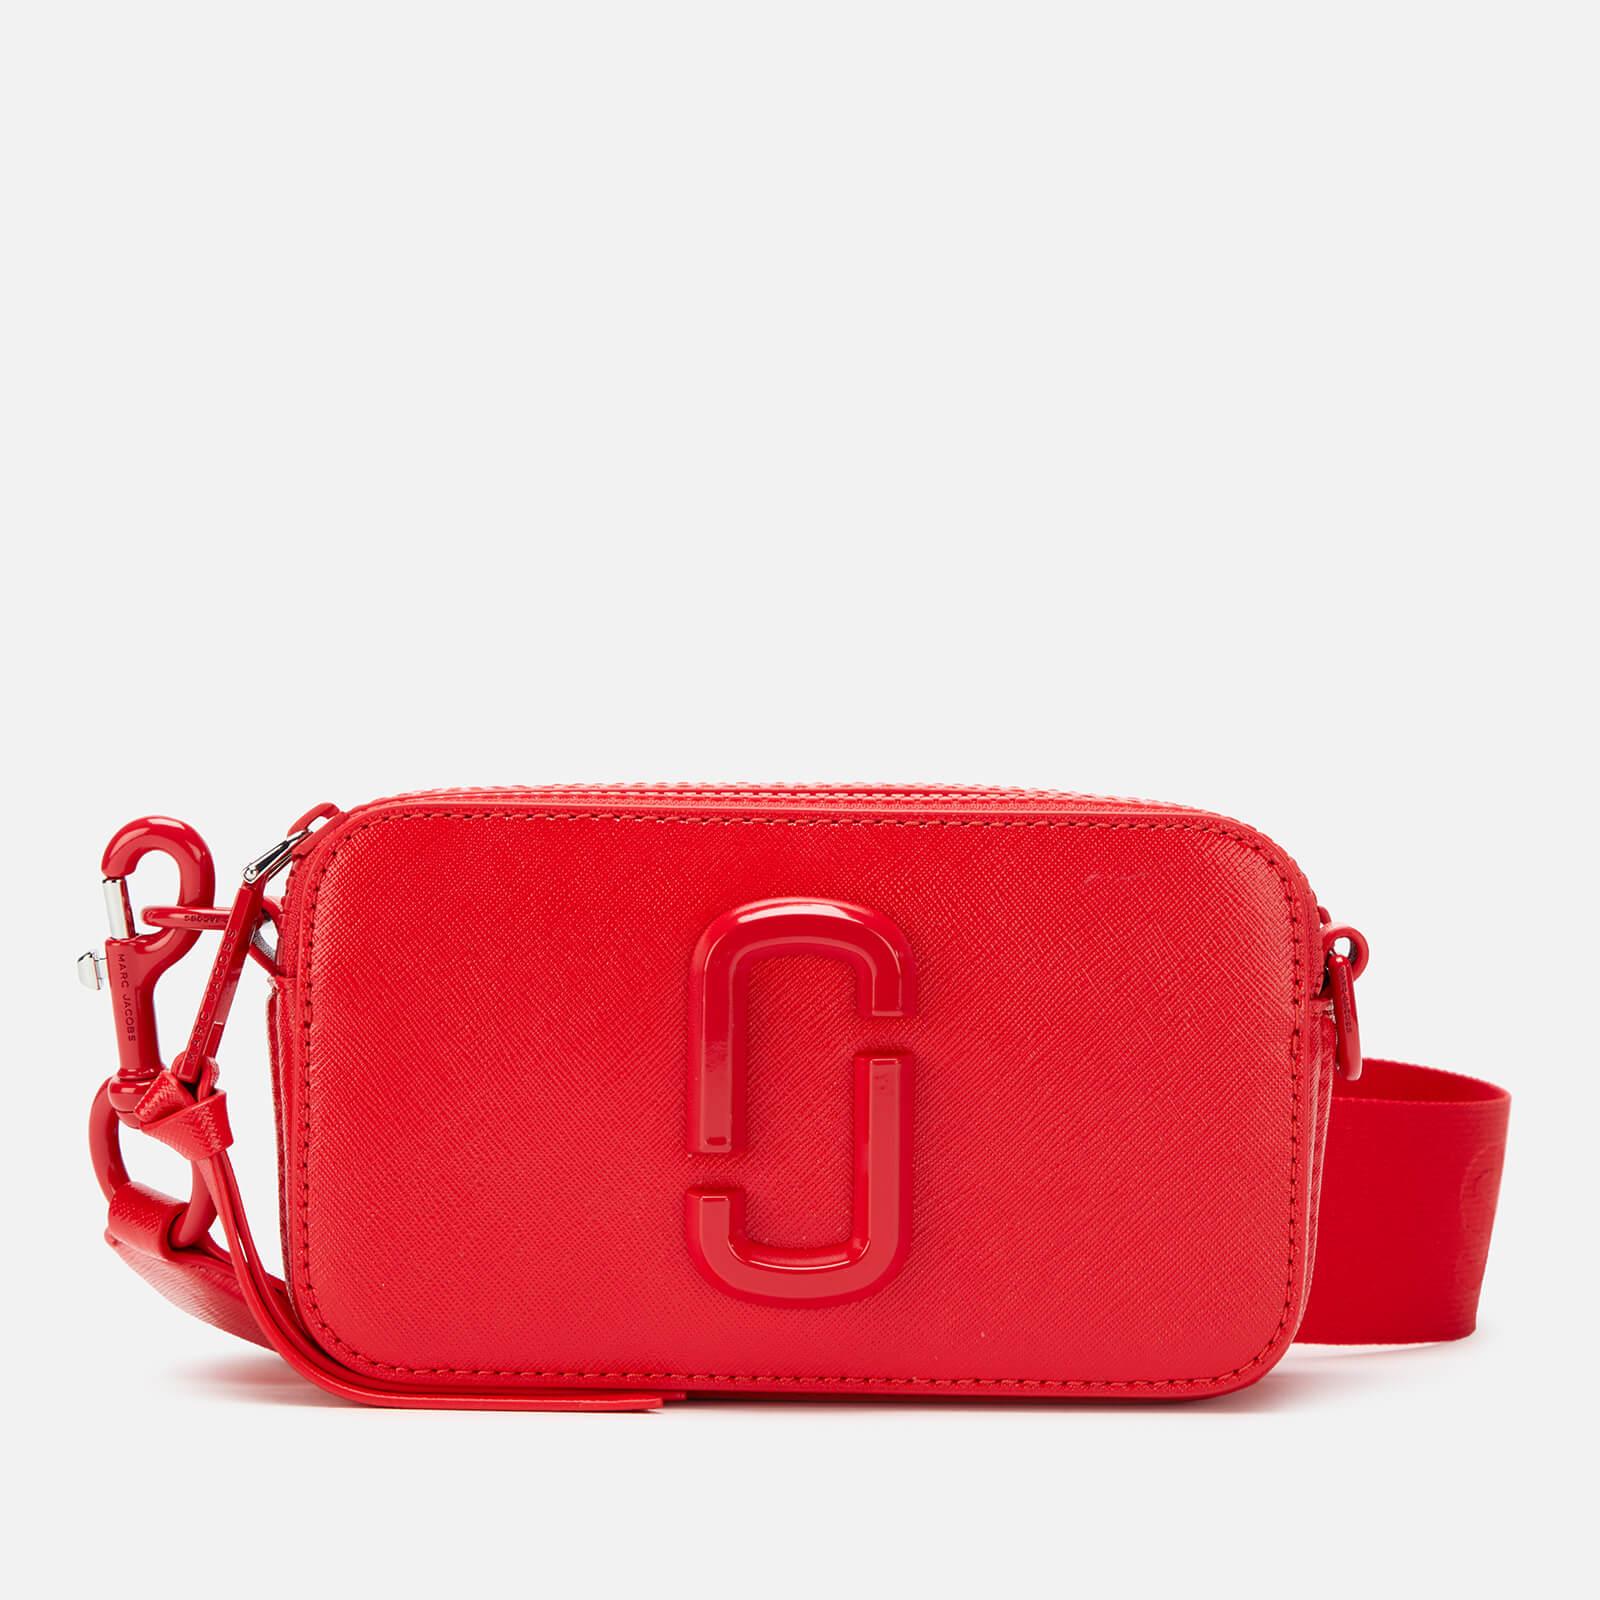 Marc Jacobs Women's Snapshot DTM Cross Body Bag - Geranium